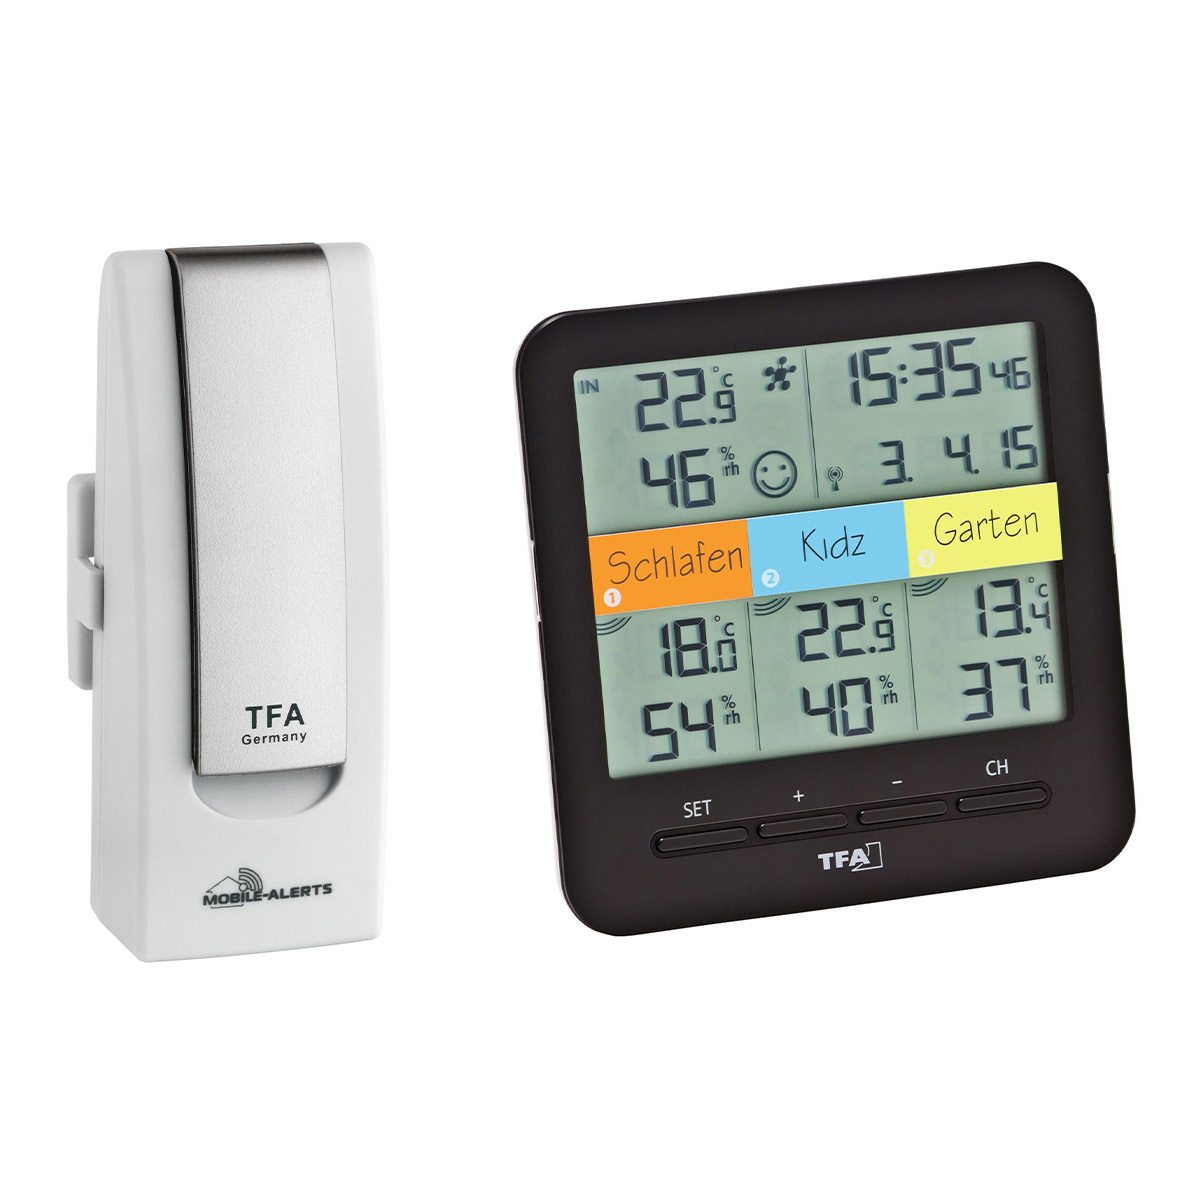 31-4007-02-starter-set-mit-klima@home-funk-thermo-hygrometer-weatherhub-ansicht-1200x1200px.jpg